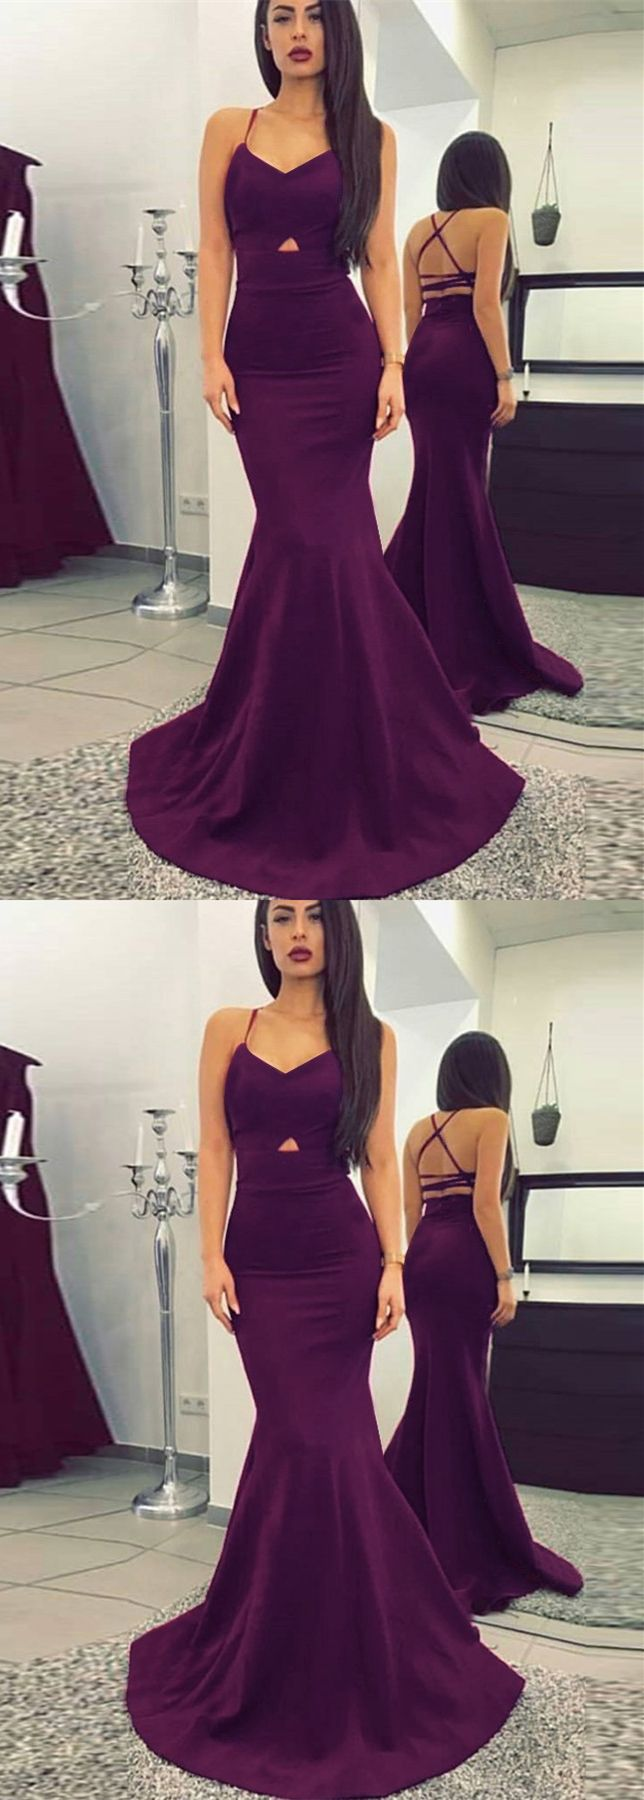 modest purple mermaid prom dresses, simple criss cross straps party dresses, elegant cut out v neck evening gowns #promdress #mermaiddress #prom2018